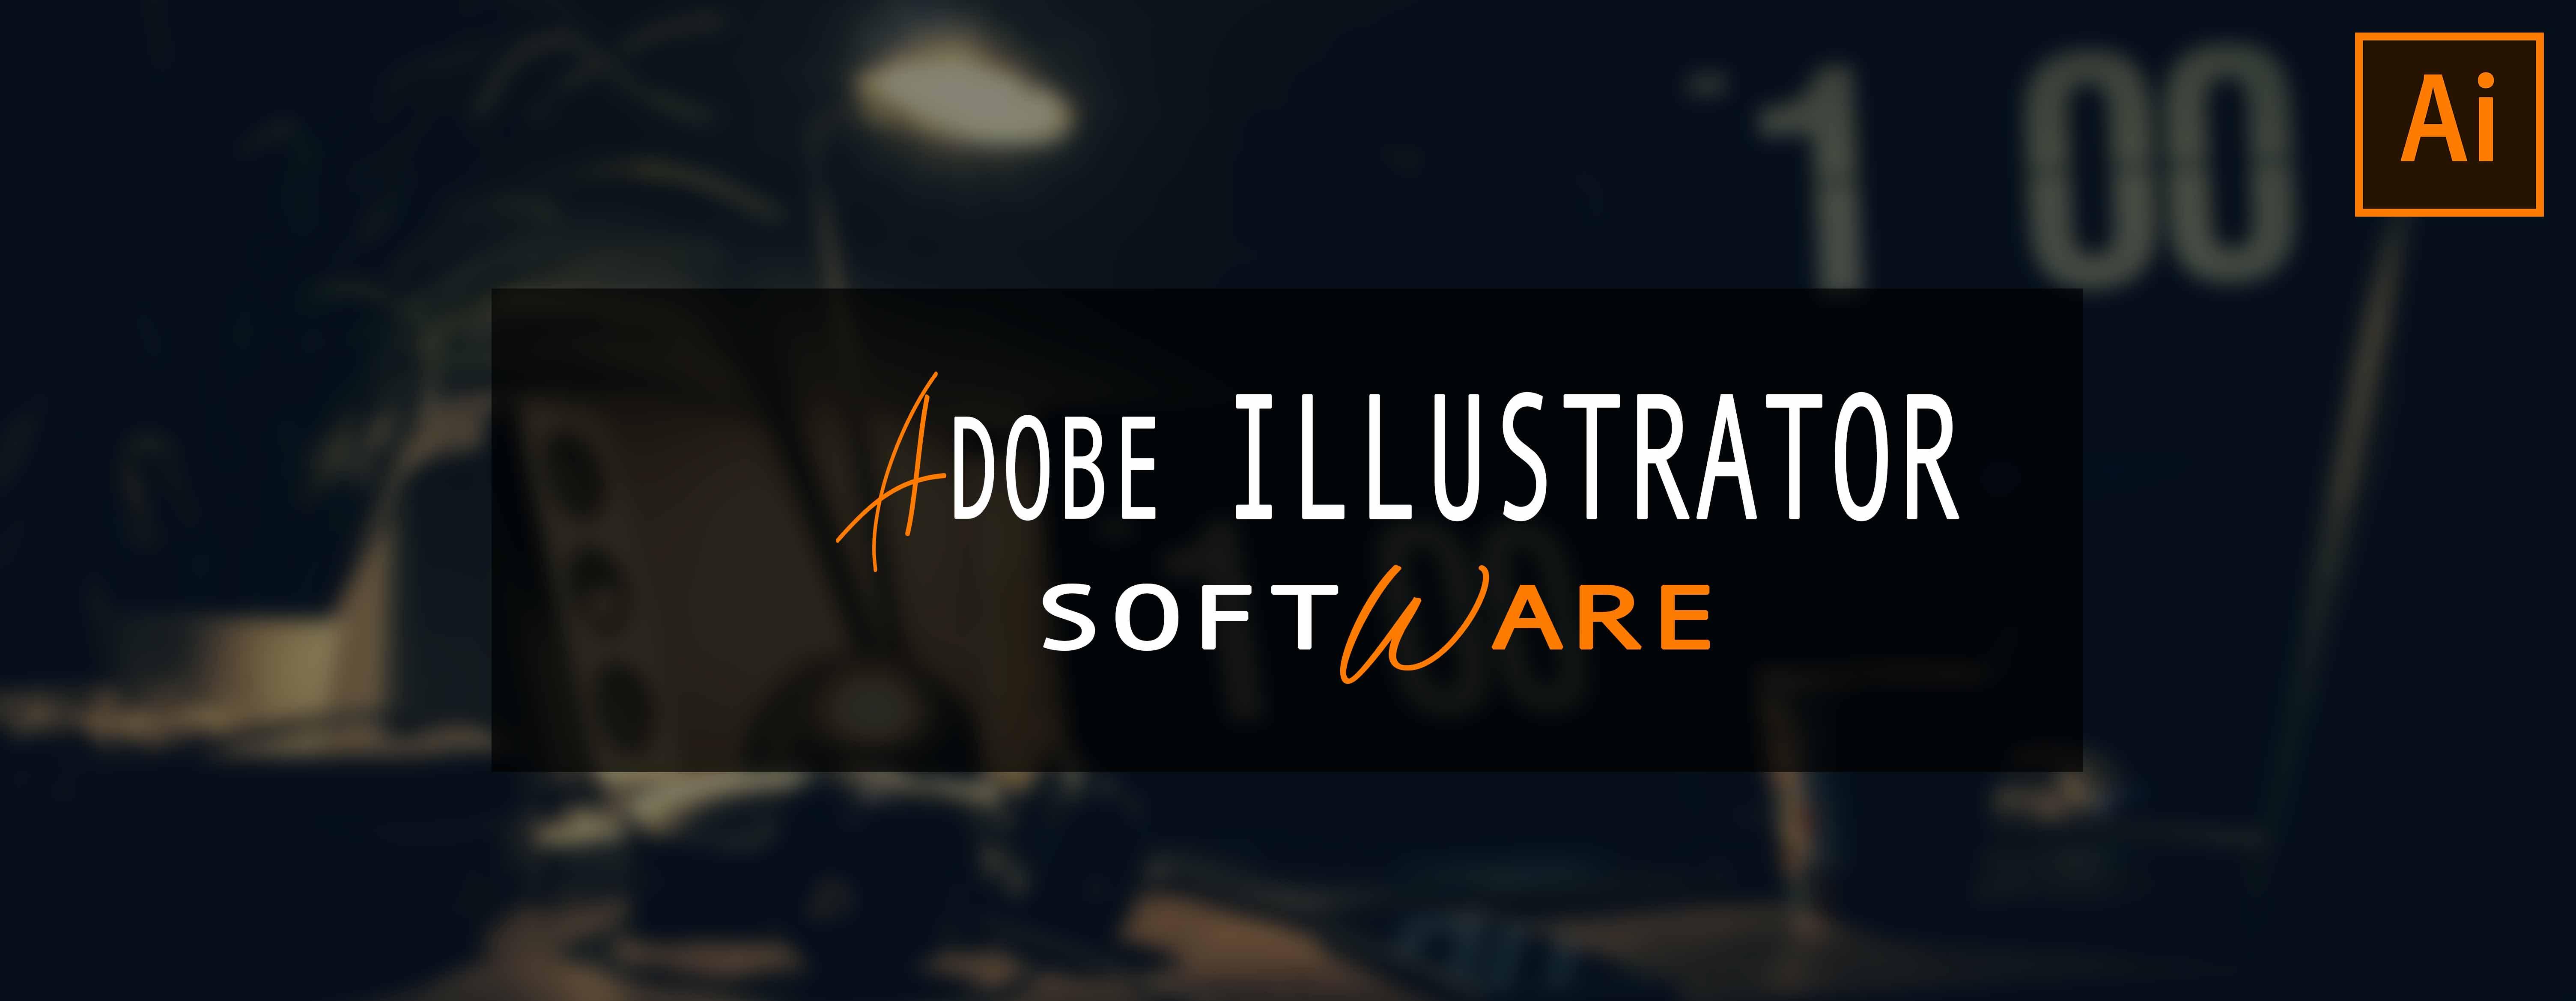 Adobe illustrator free download